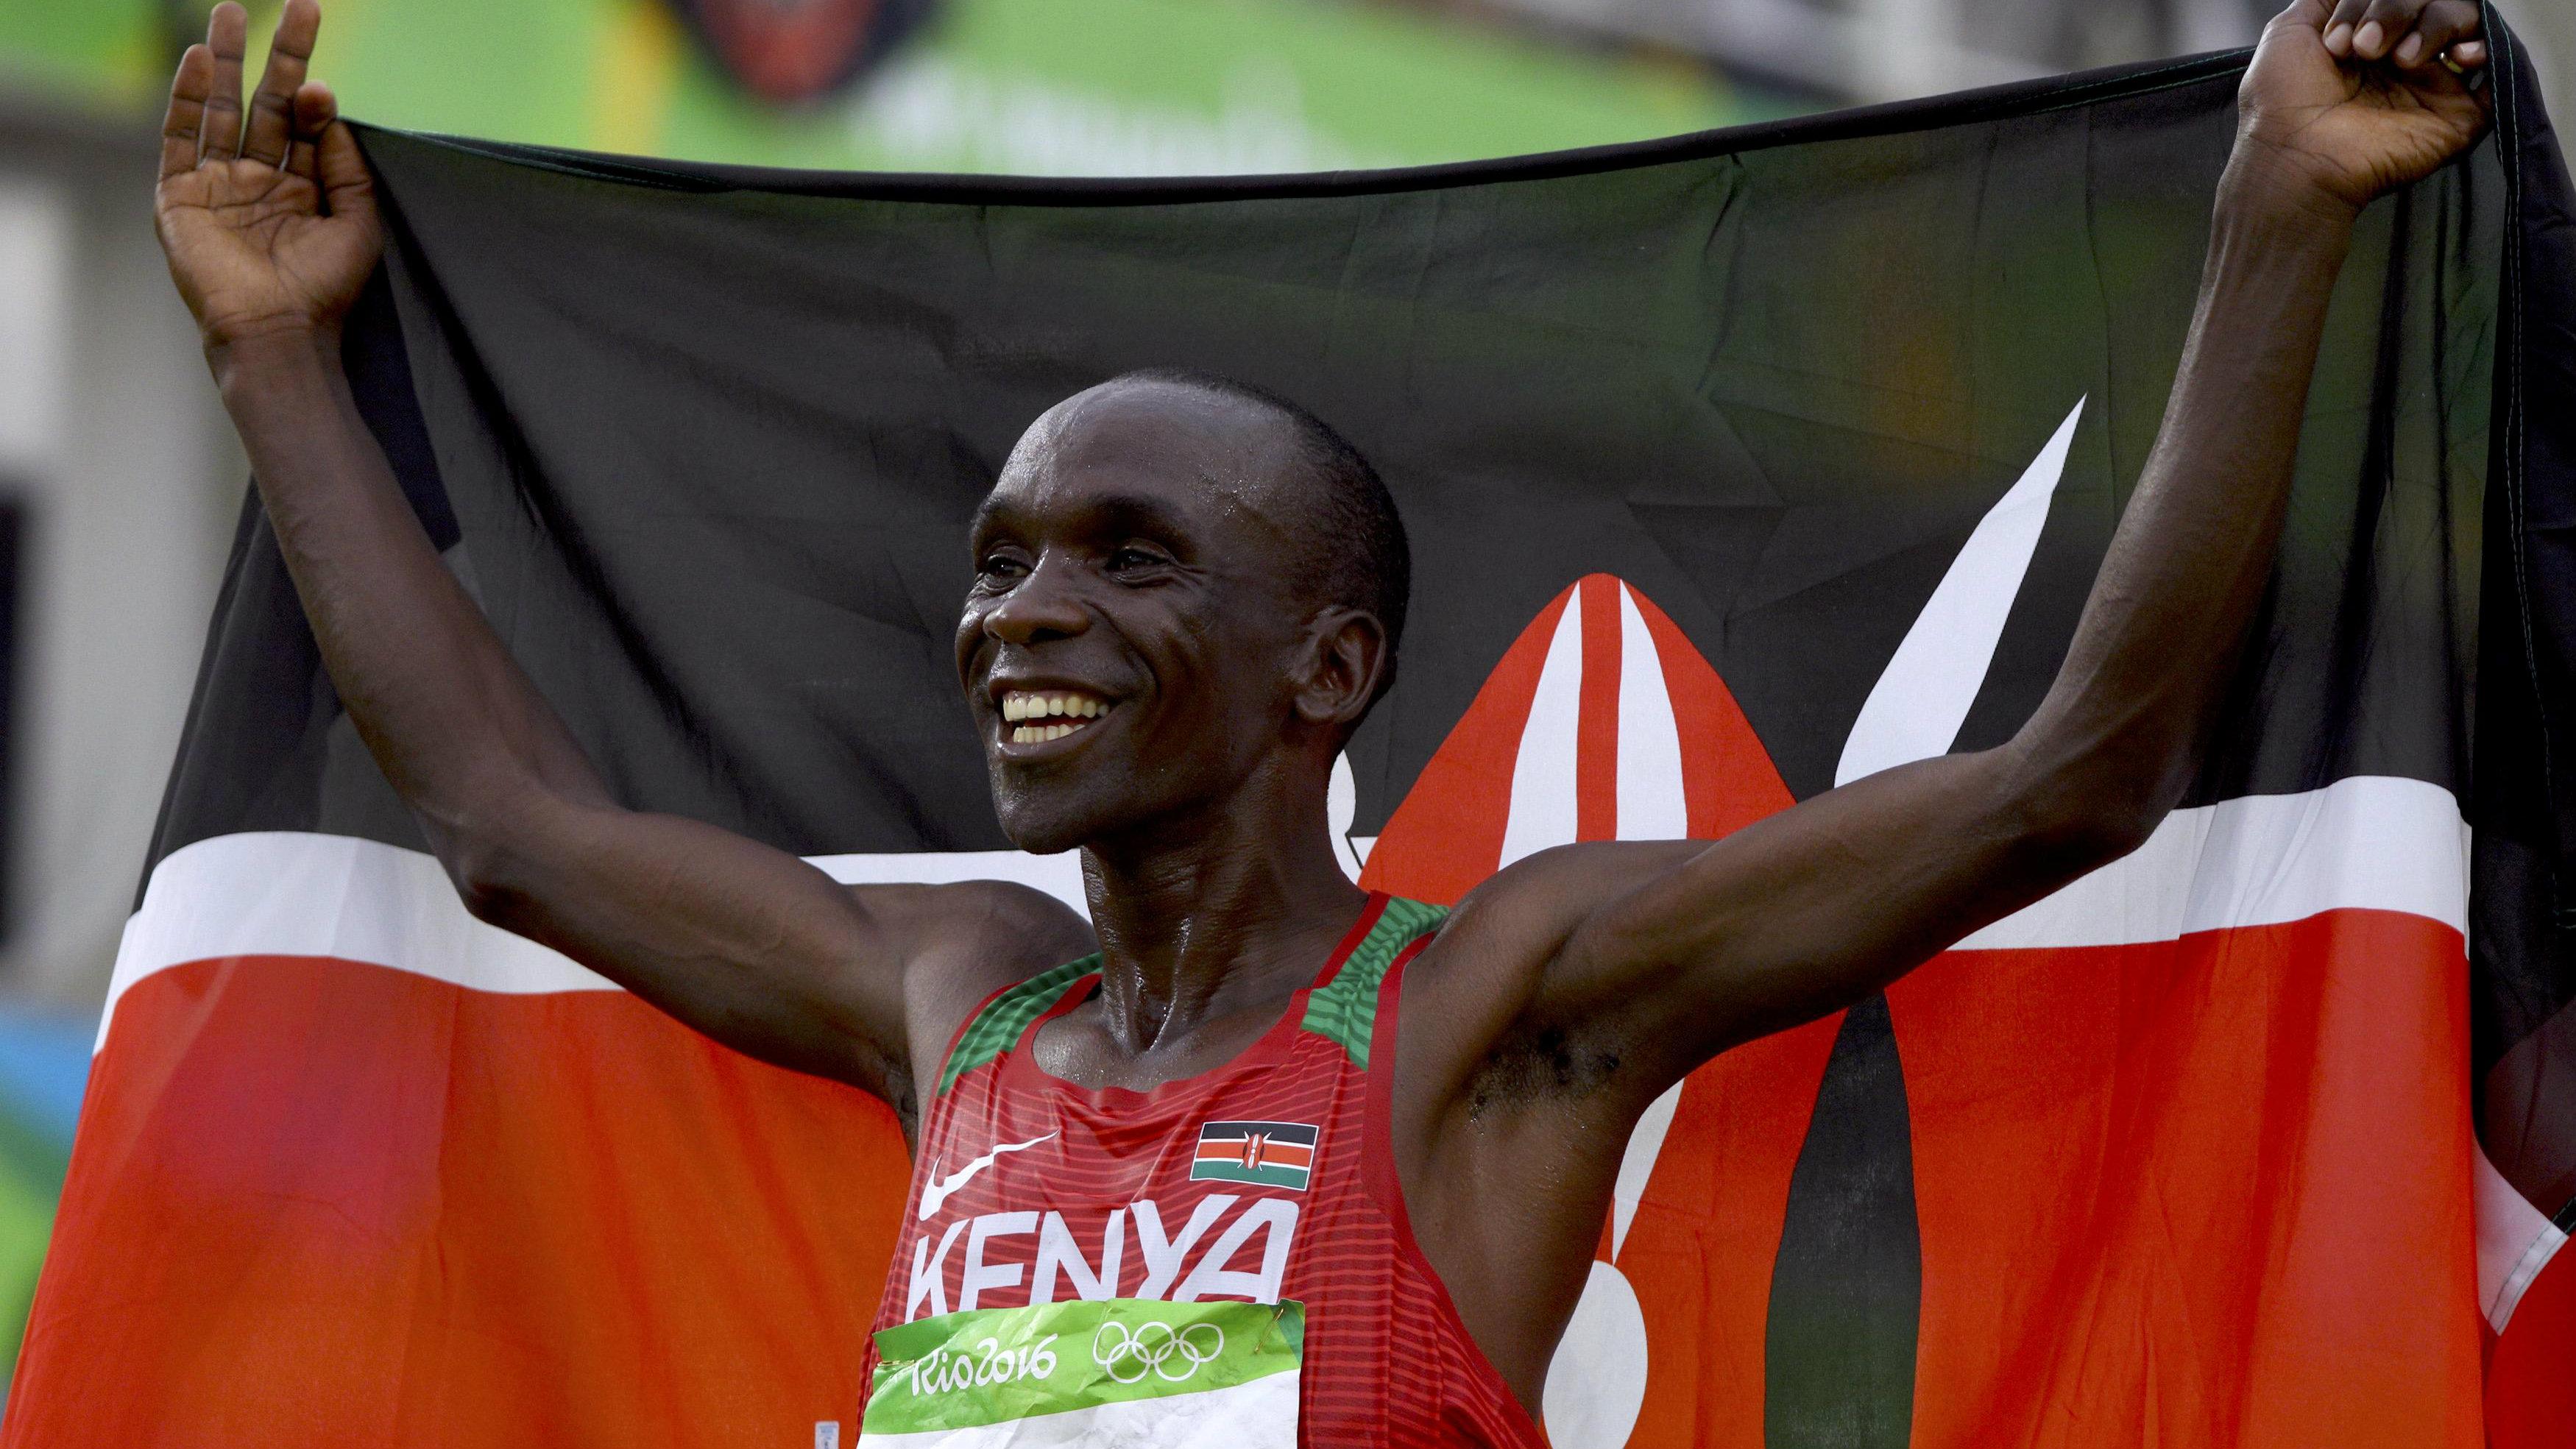 Eliud Kipchoge (KEN) of Kenya celebrates after winning the race